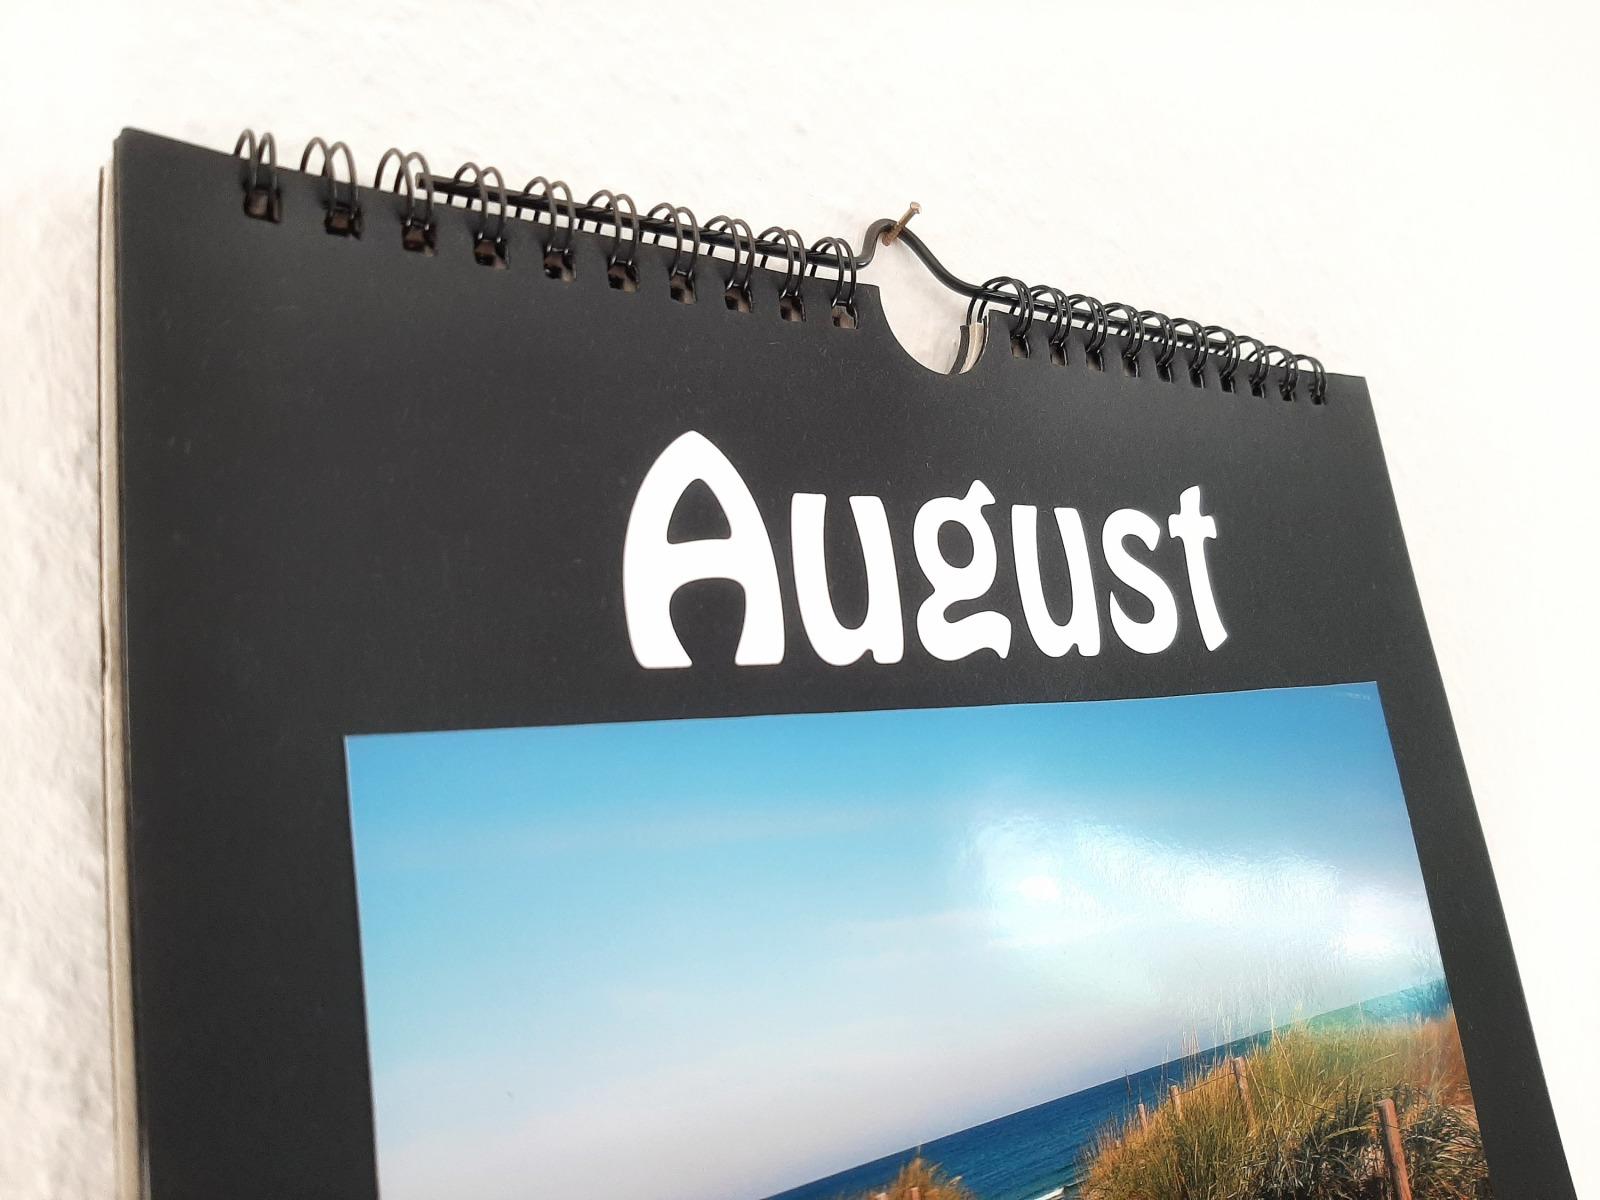 Monate Aufkleber Januar Monatsnamen Aufkleber für